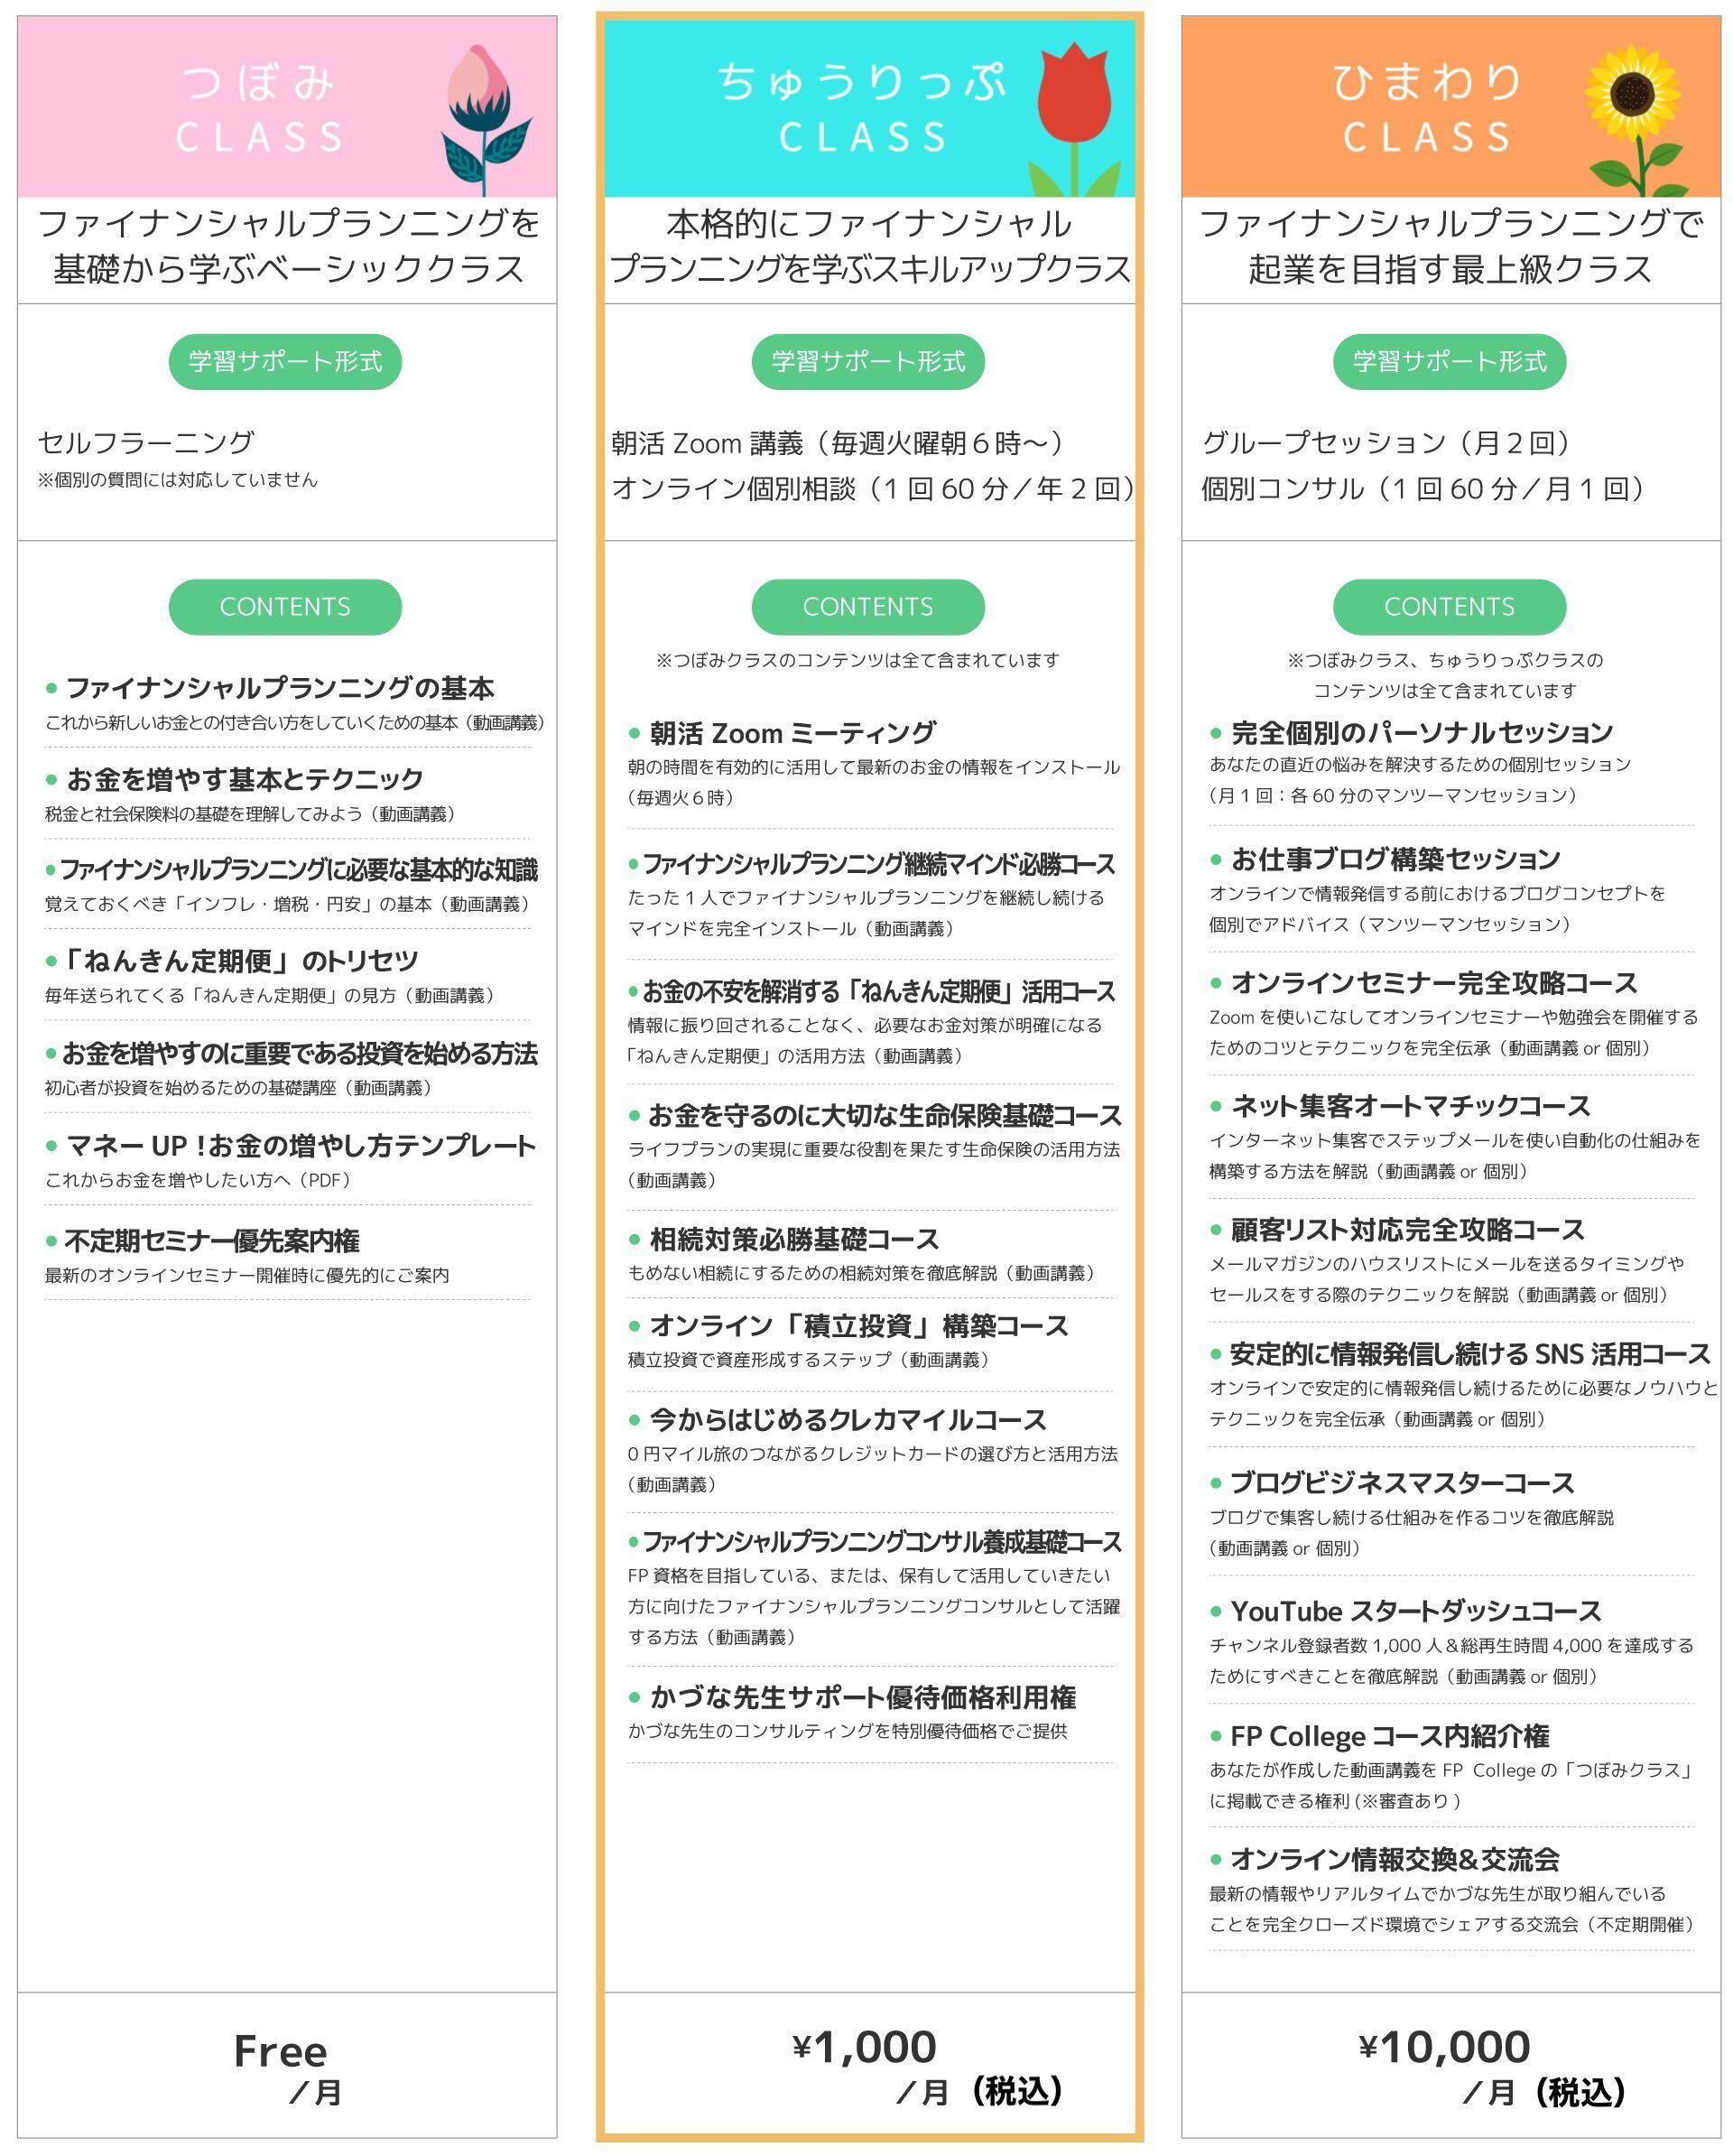 【FP College】メニュー